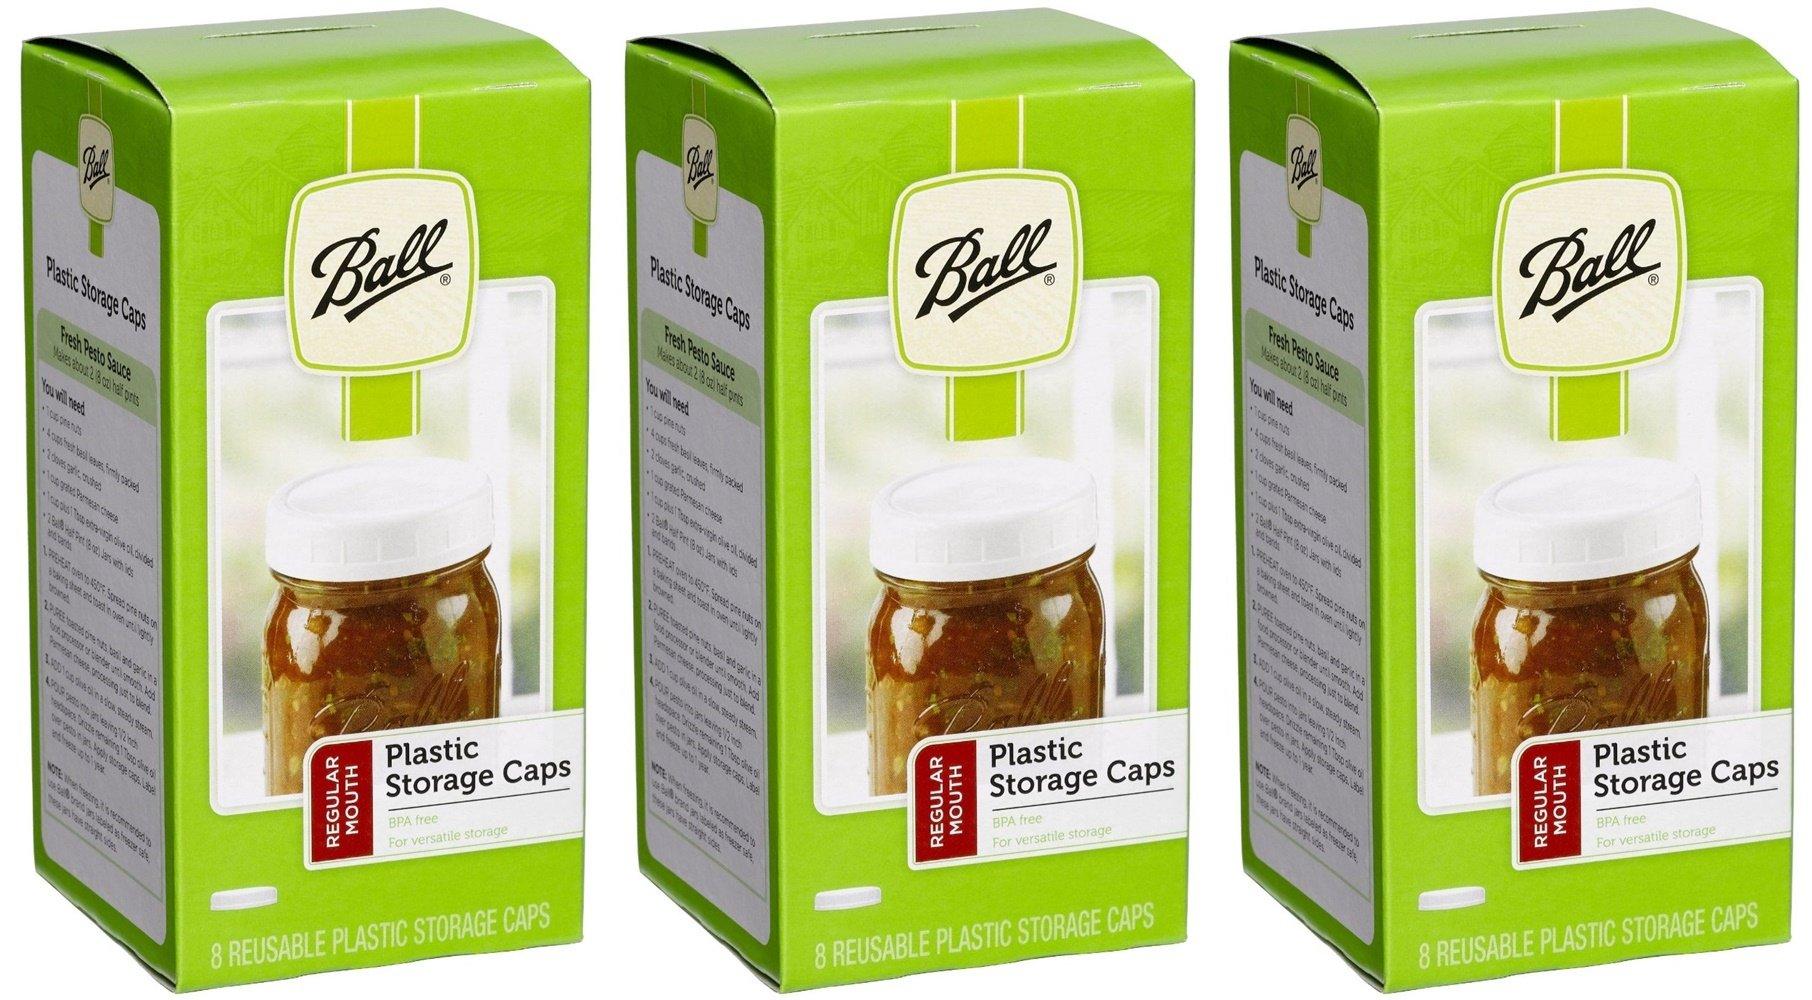 24 Ball Regular Mouth Jar Storage Caps (3-Pack of 8)